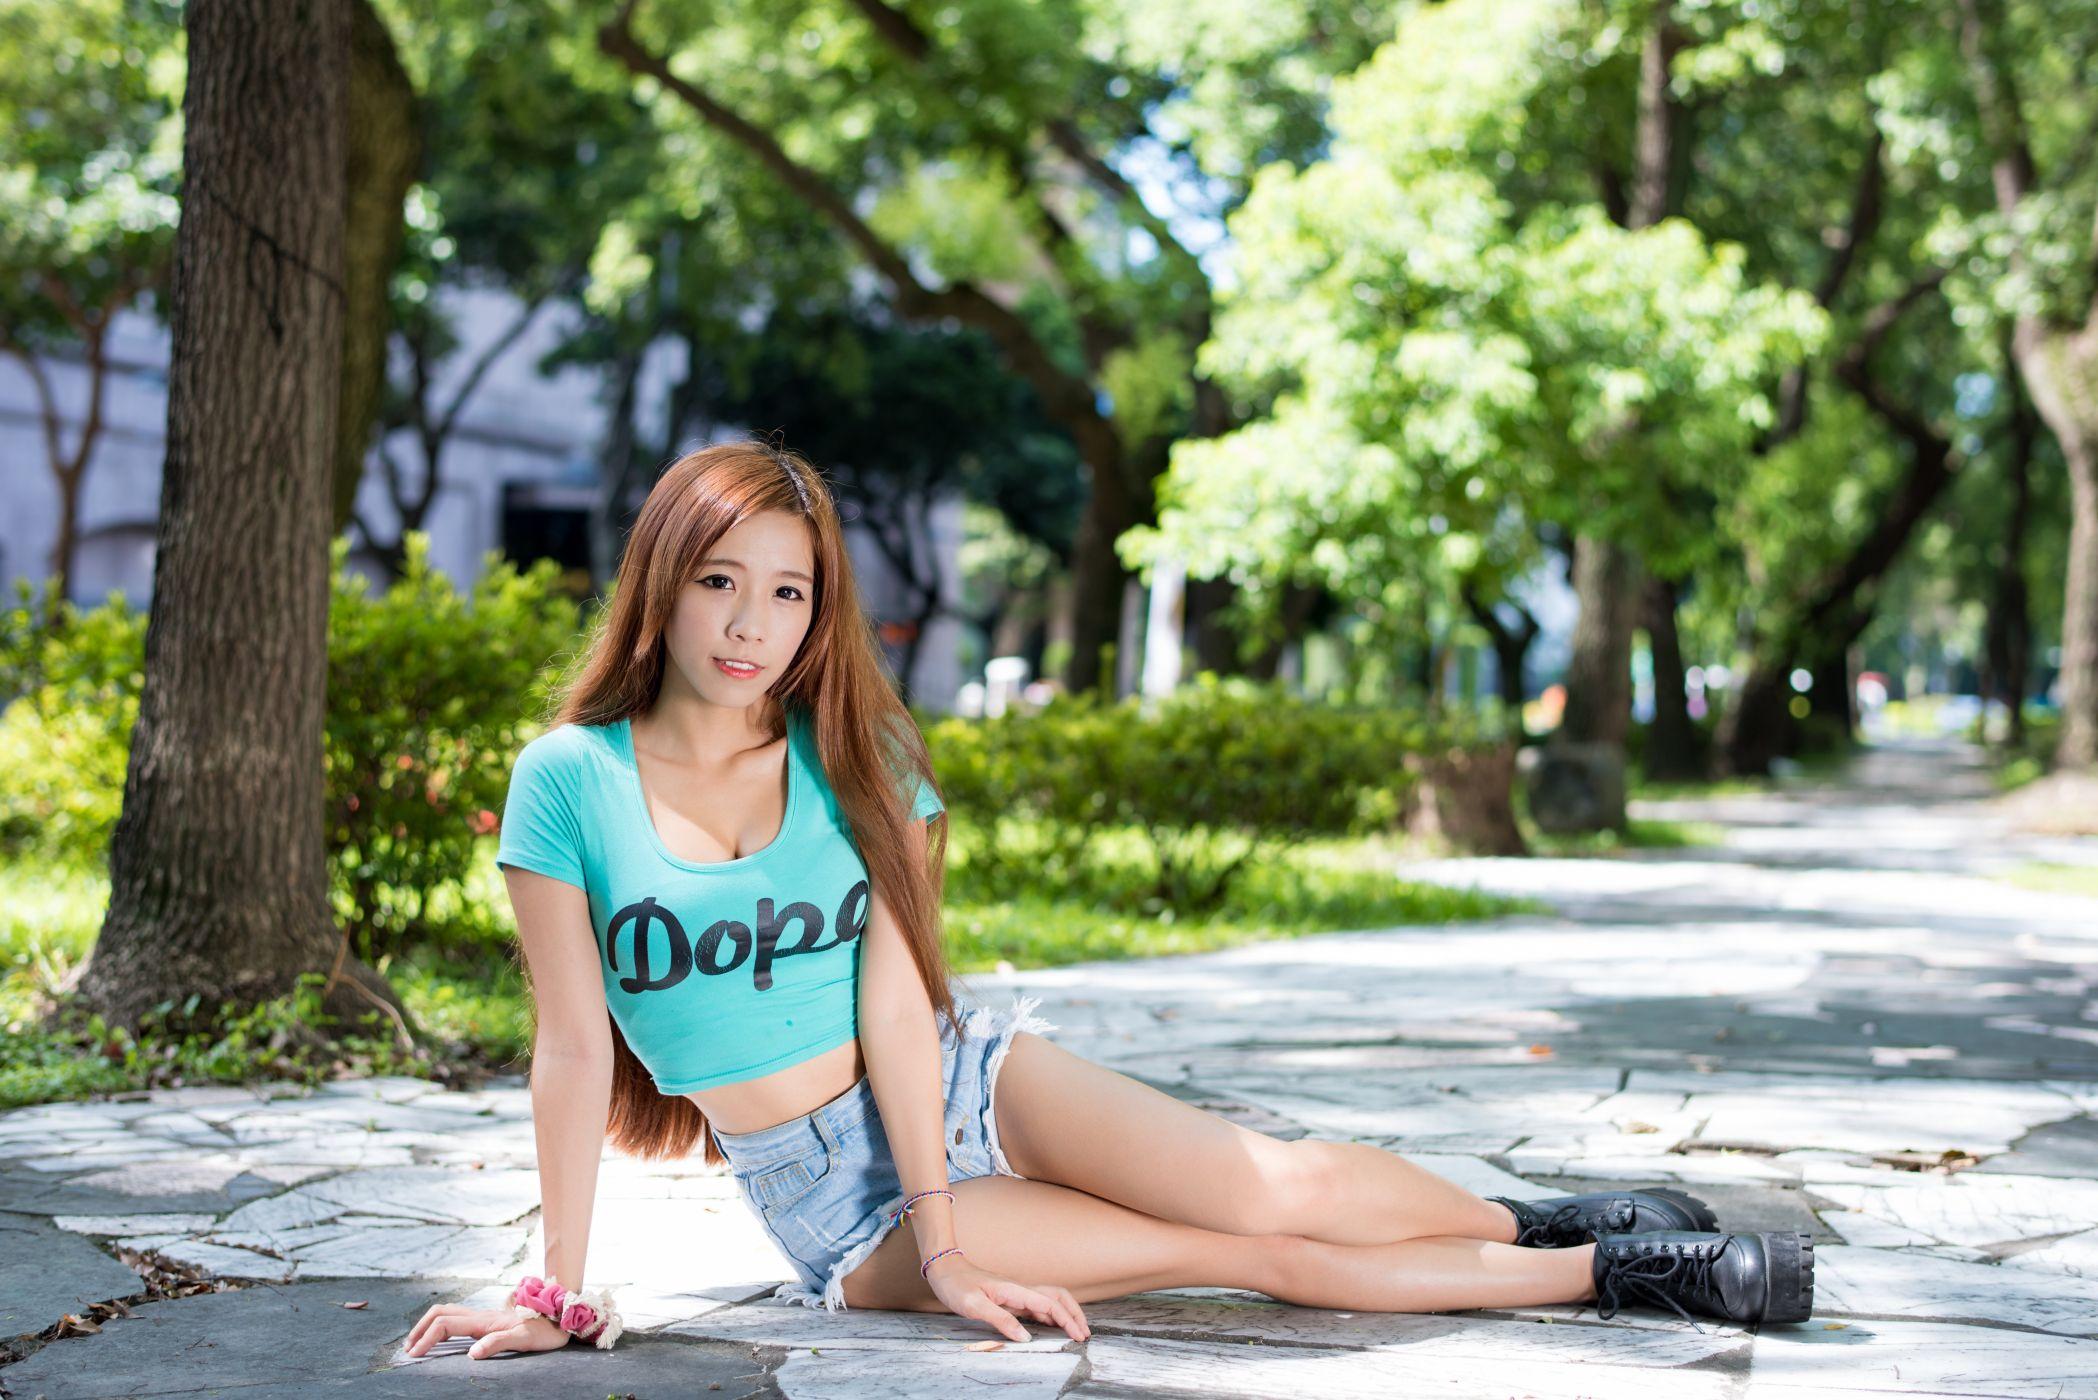 short-sweet-asian-girls-xtraordinary-pictures-mature-kink